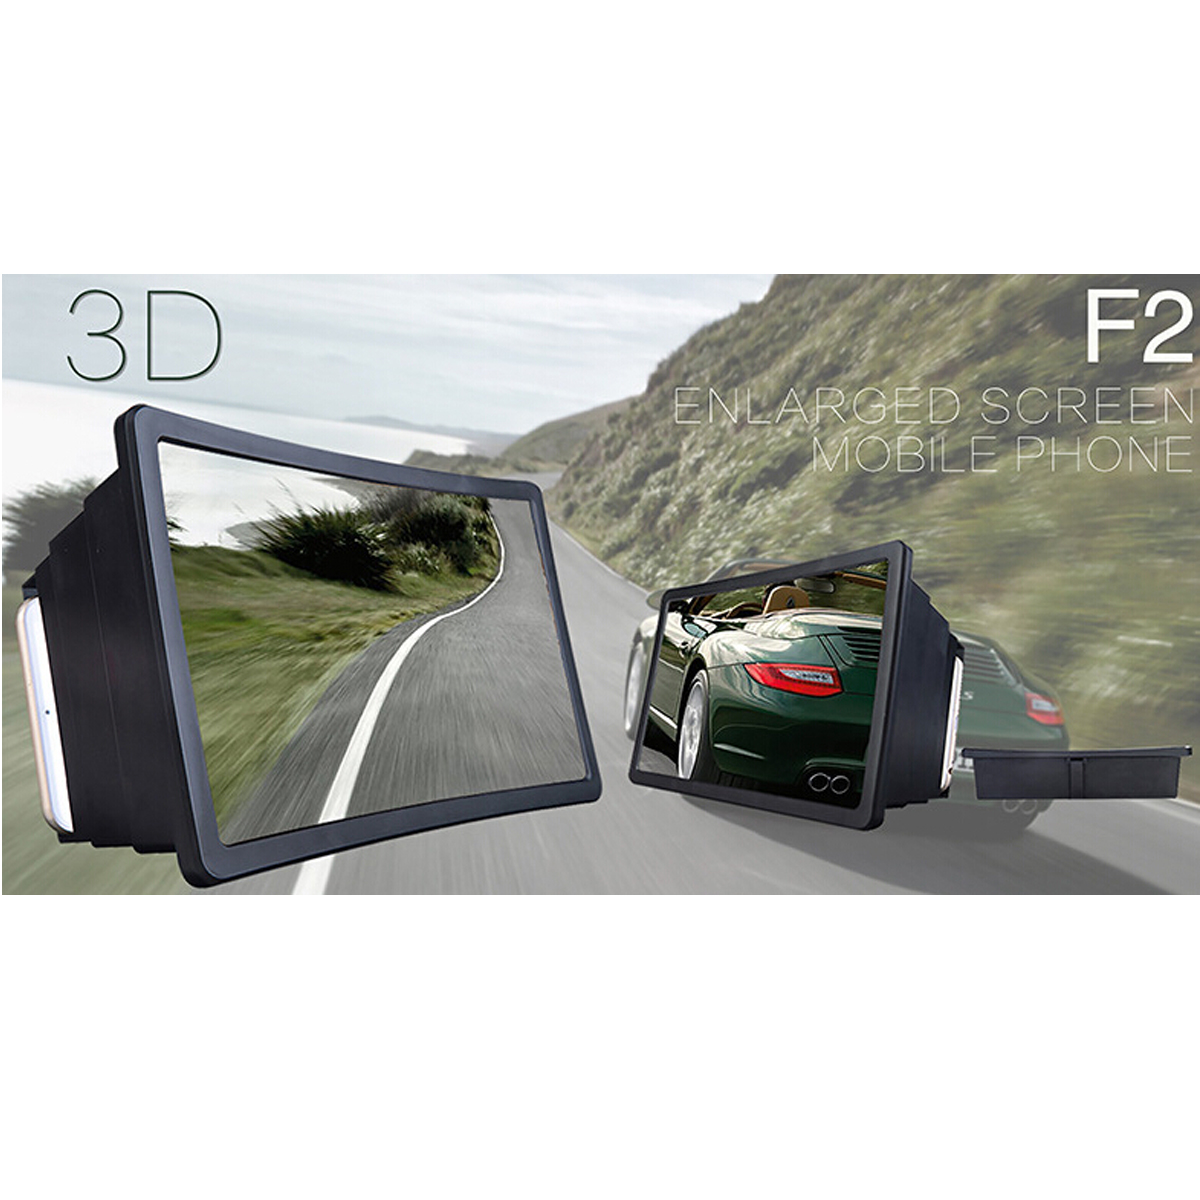 3DView Screen